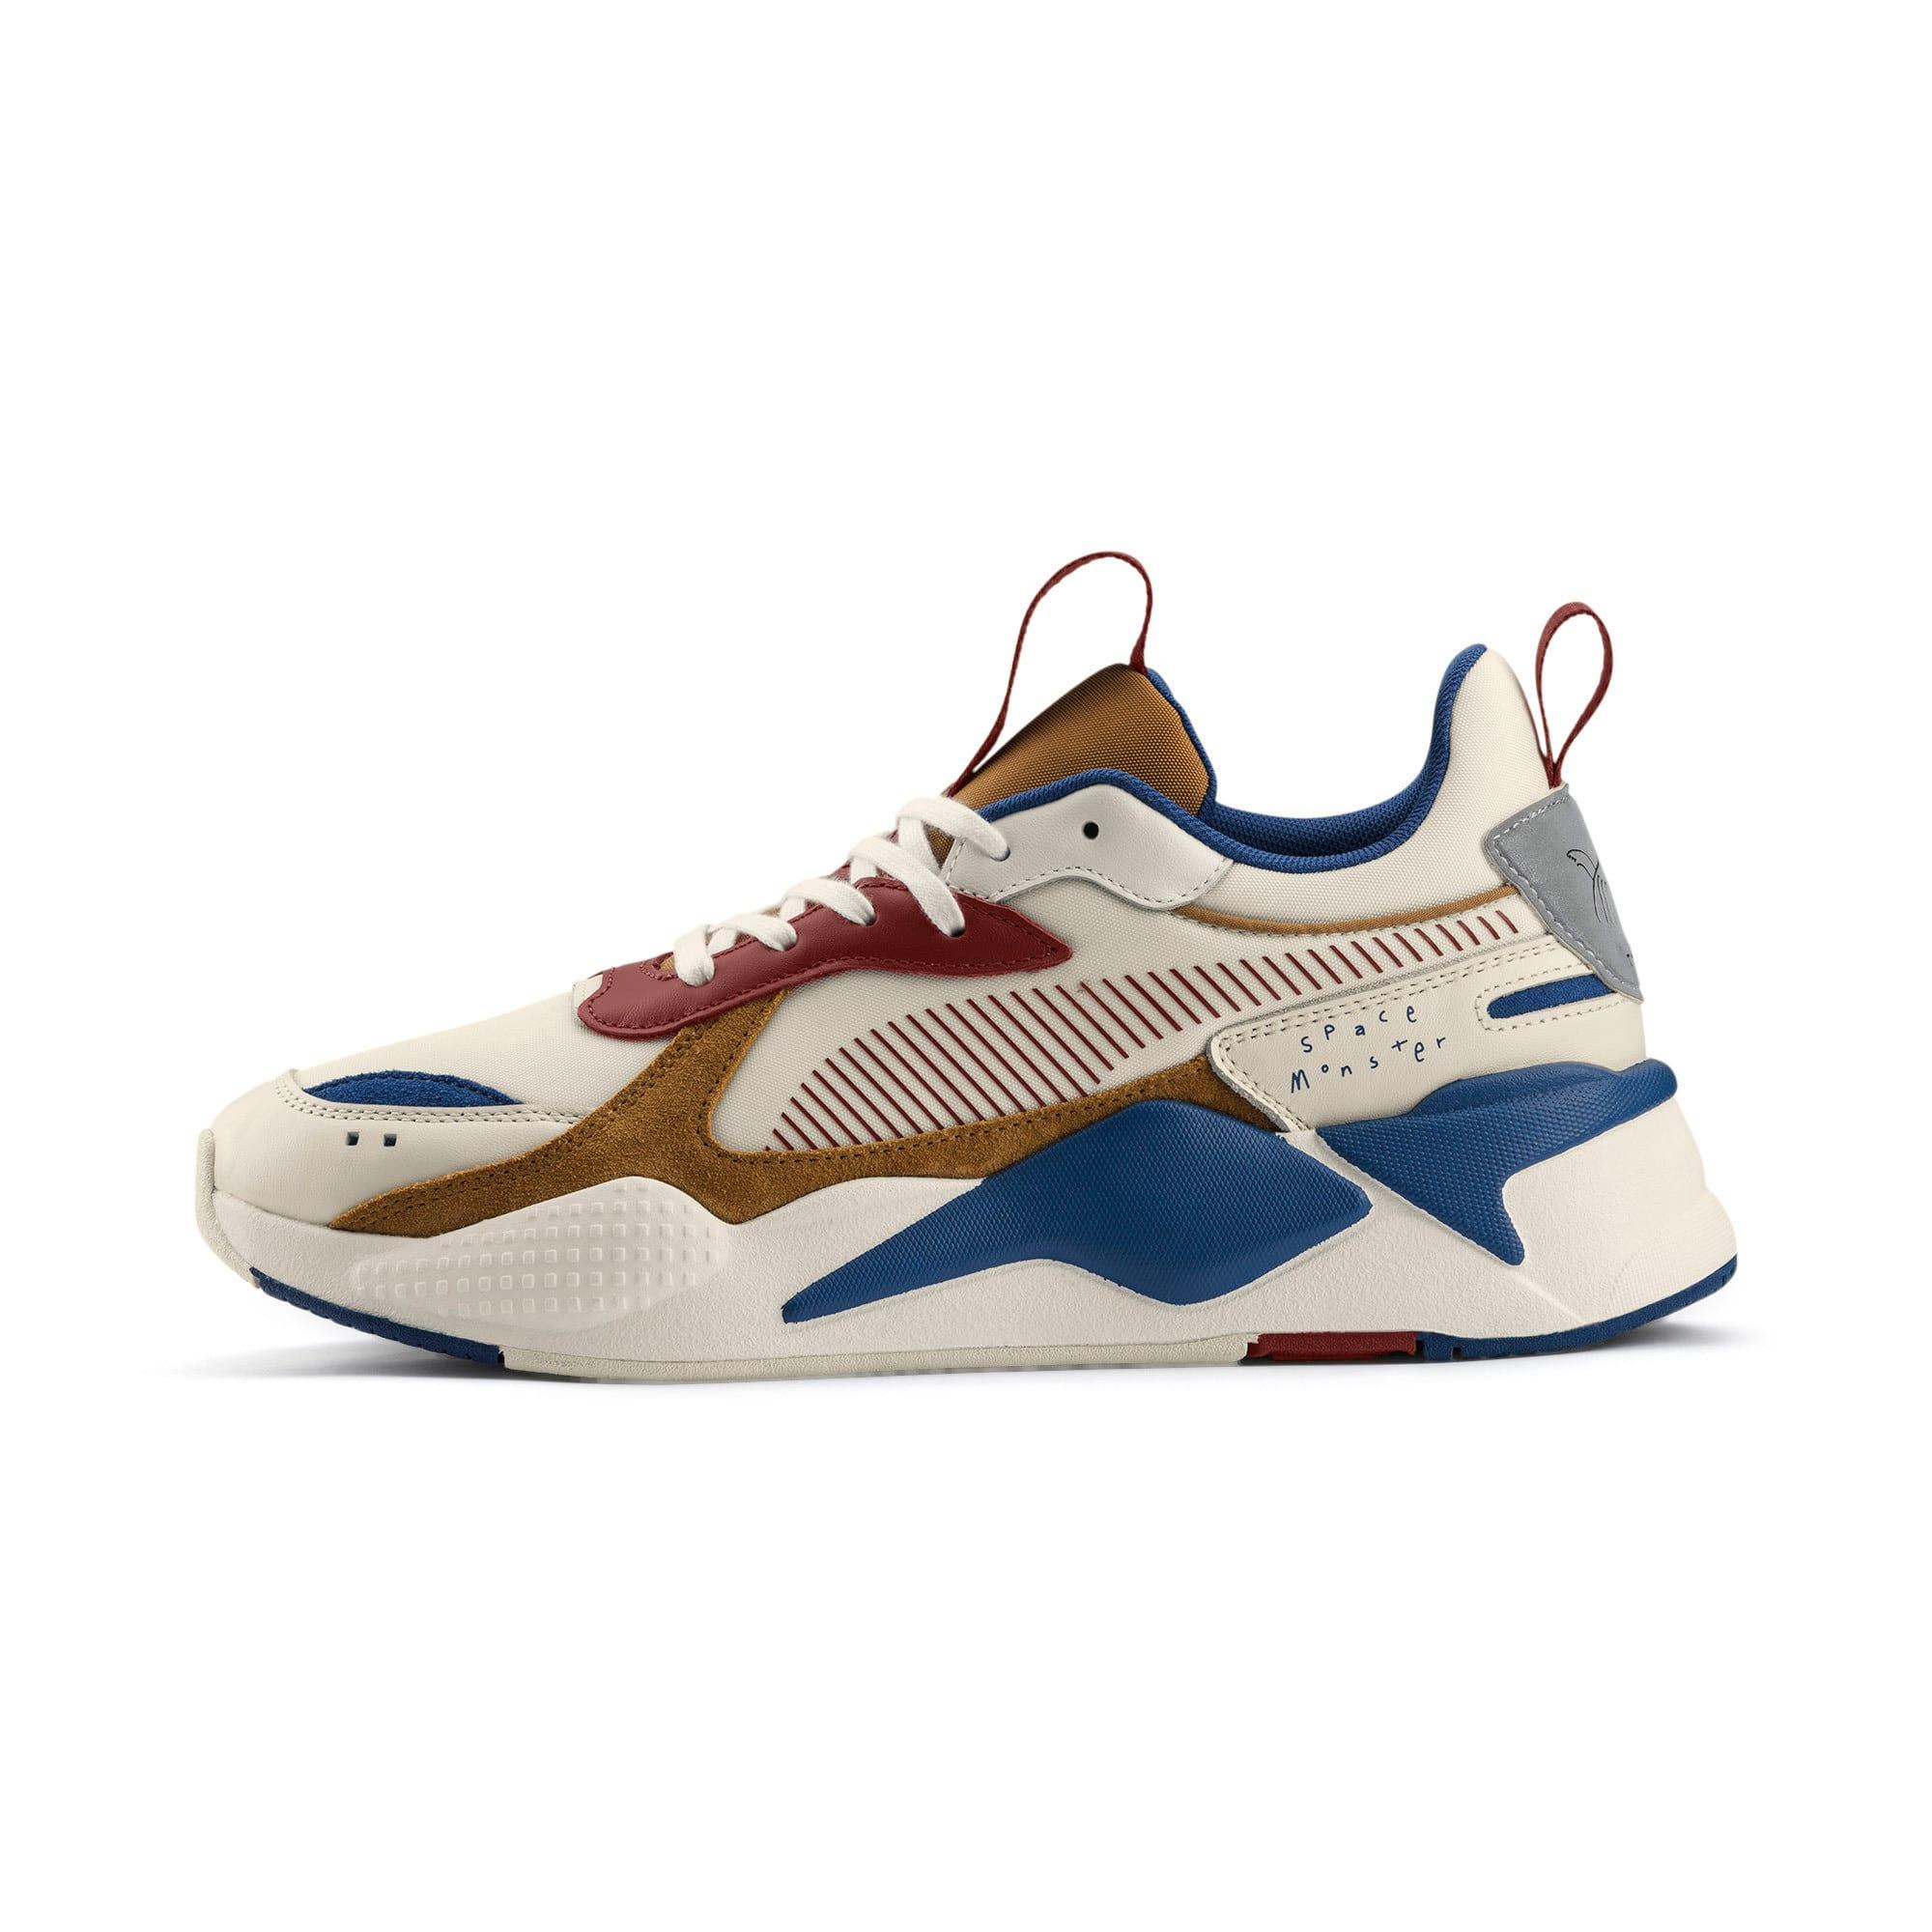 new arrival a0715 75e52 PUMA x TYAKASHA RS-X Men's Sneakers